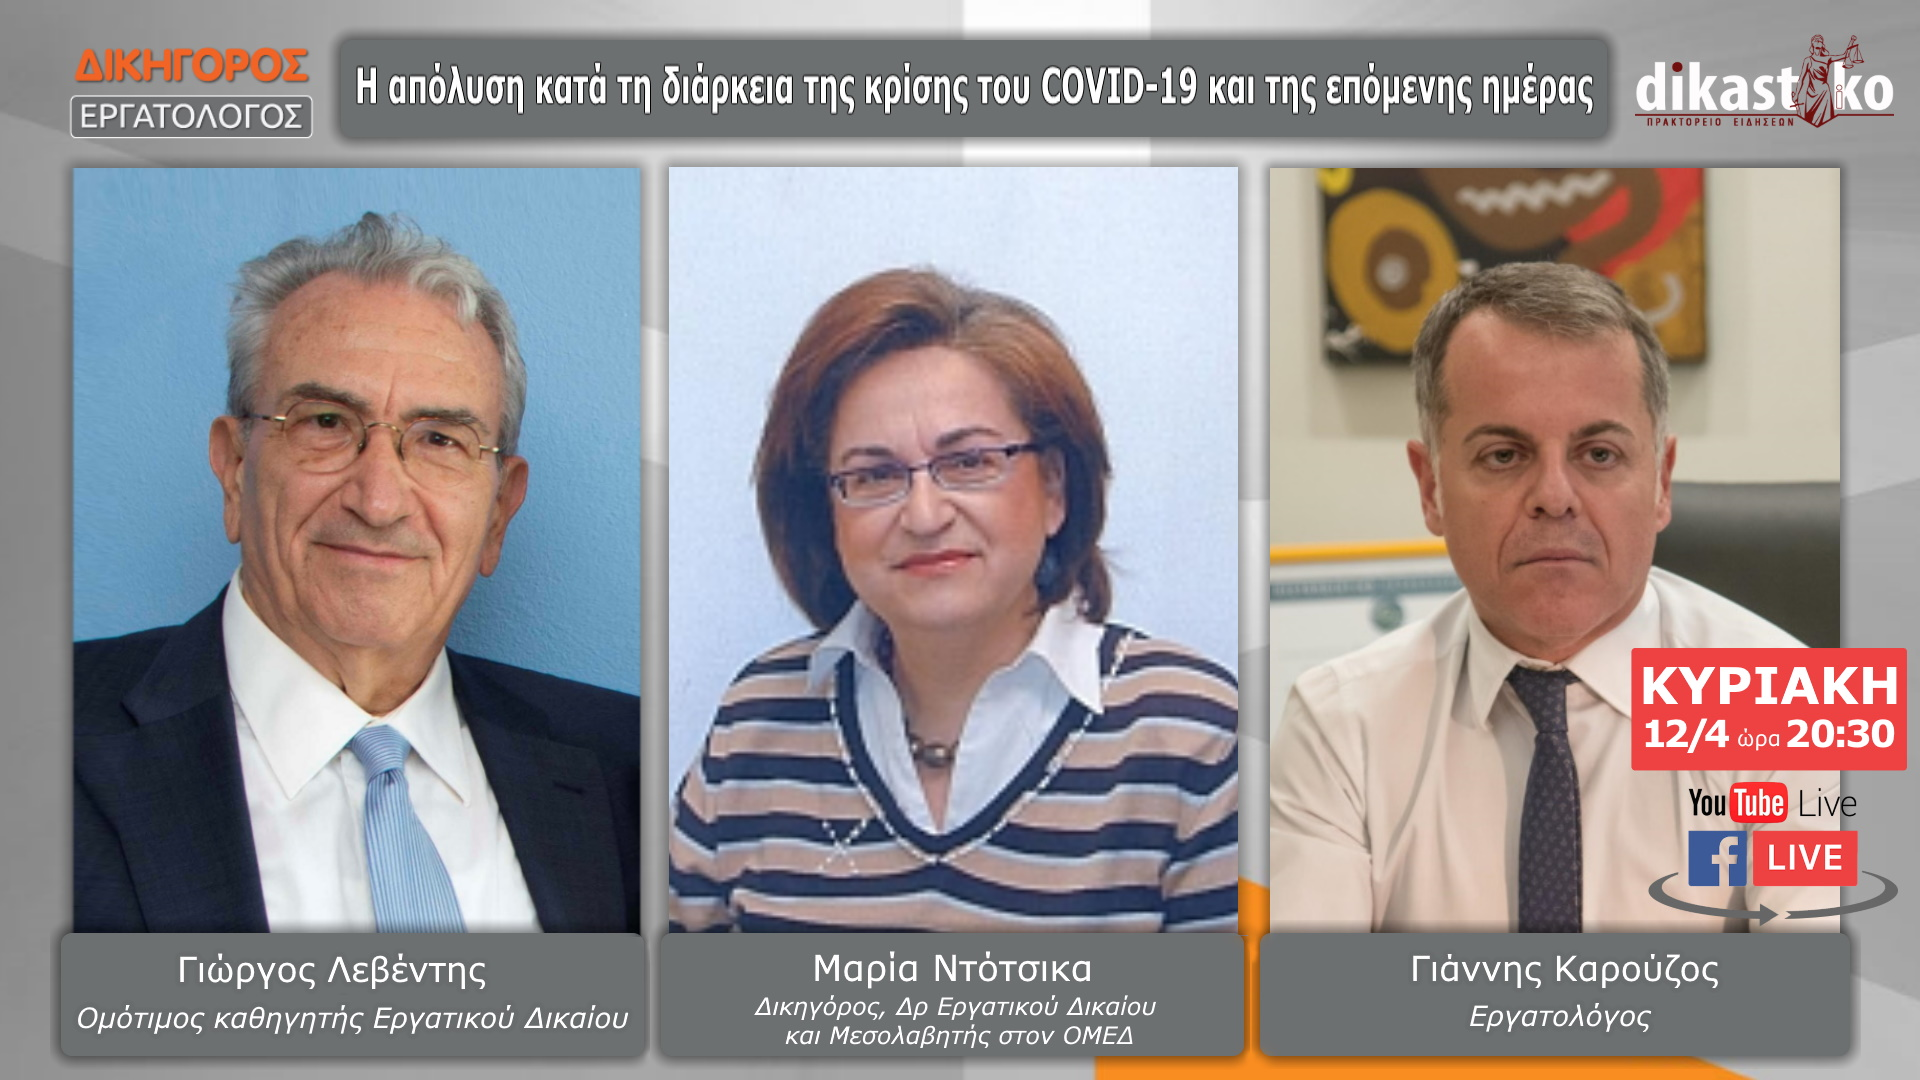 Live streaming: «Η απόλυση κατά τη διάρκεια της κρίσης του COVID-19 και της επόμενης ημέρας»